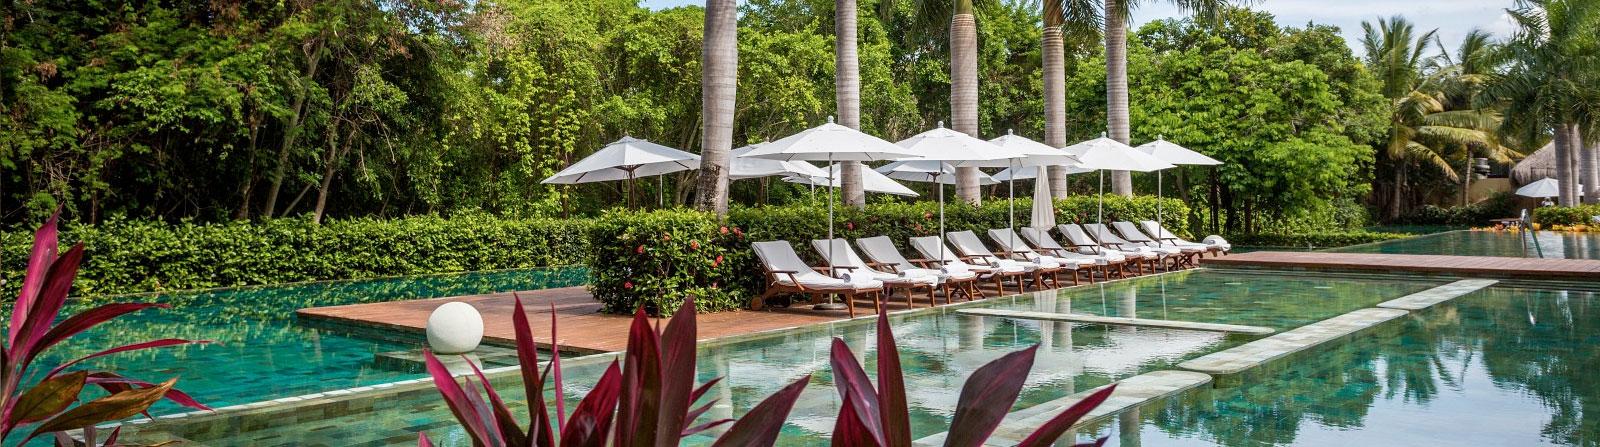 Grand Velas Riviera Maya Mexico Pool